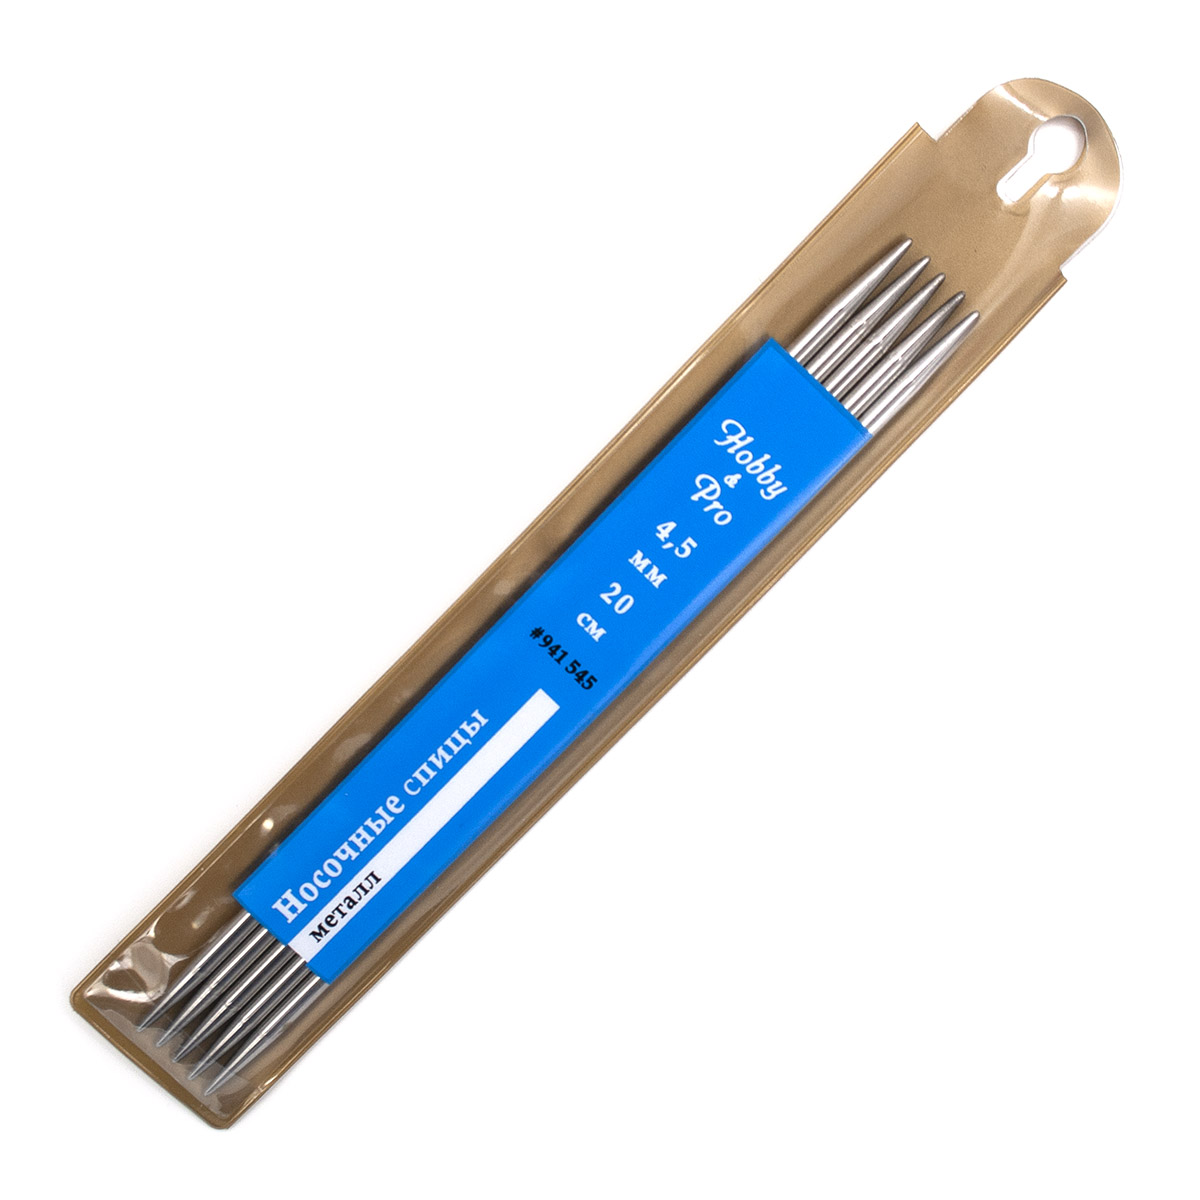 Спицы носочные металл 941545, 20 см, 4,5 мм, Hobby&Pro